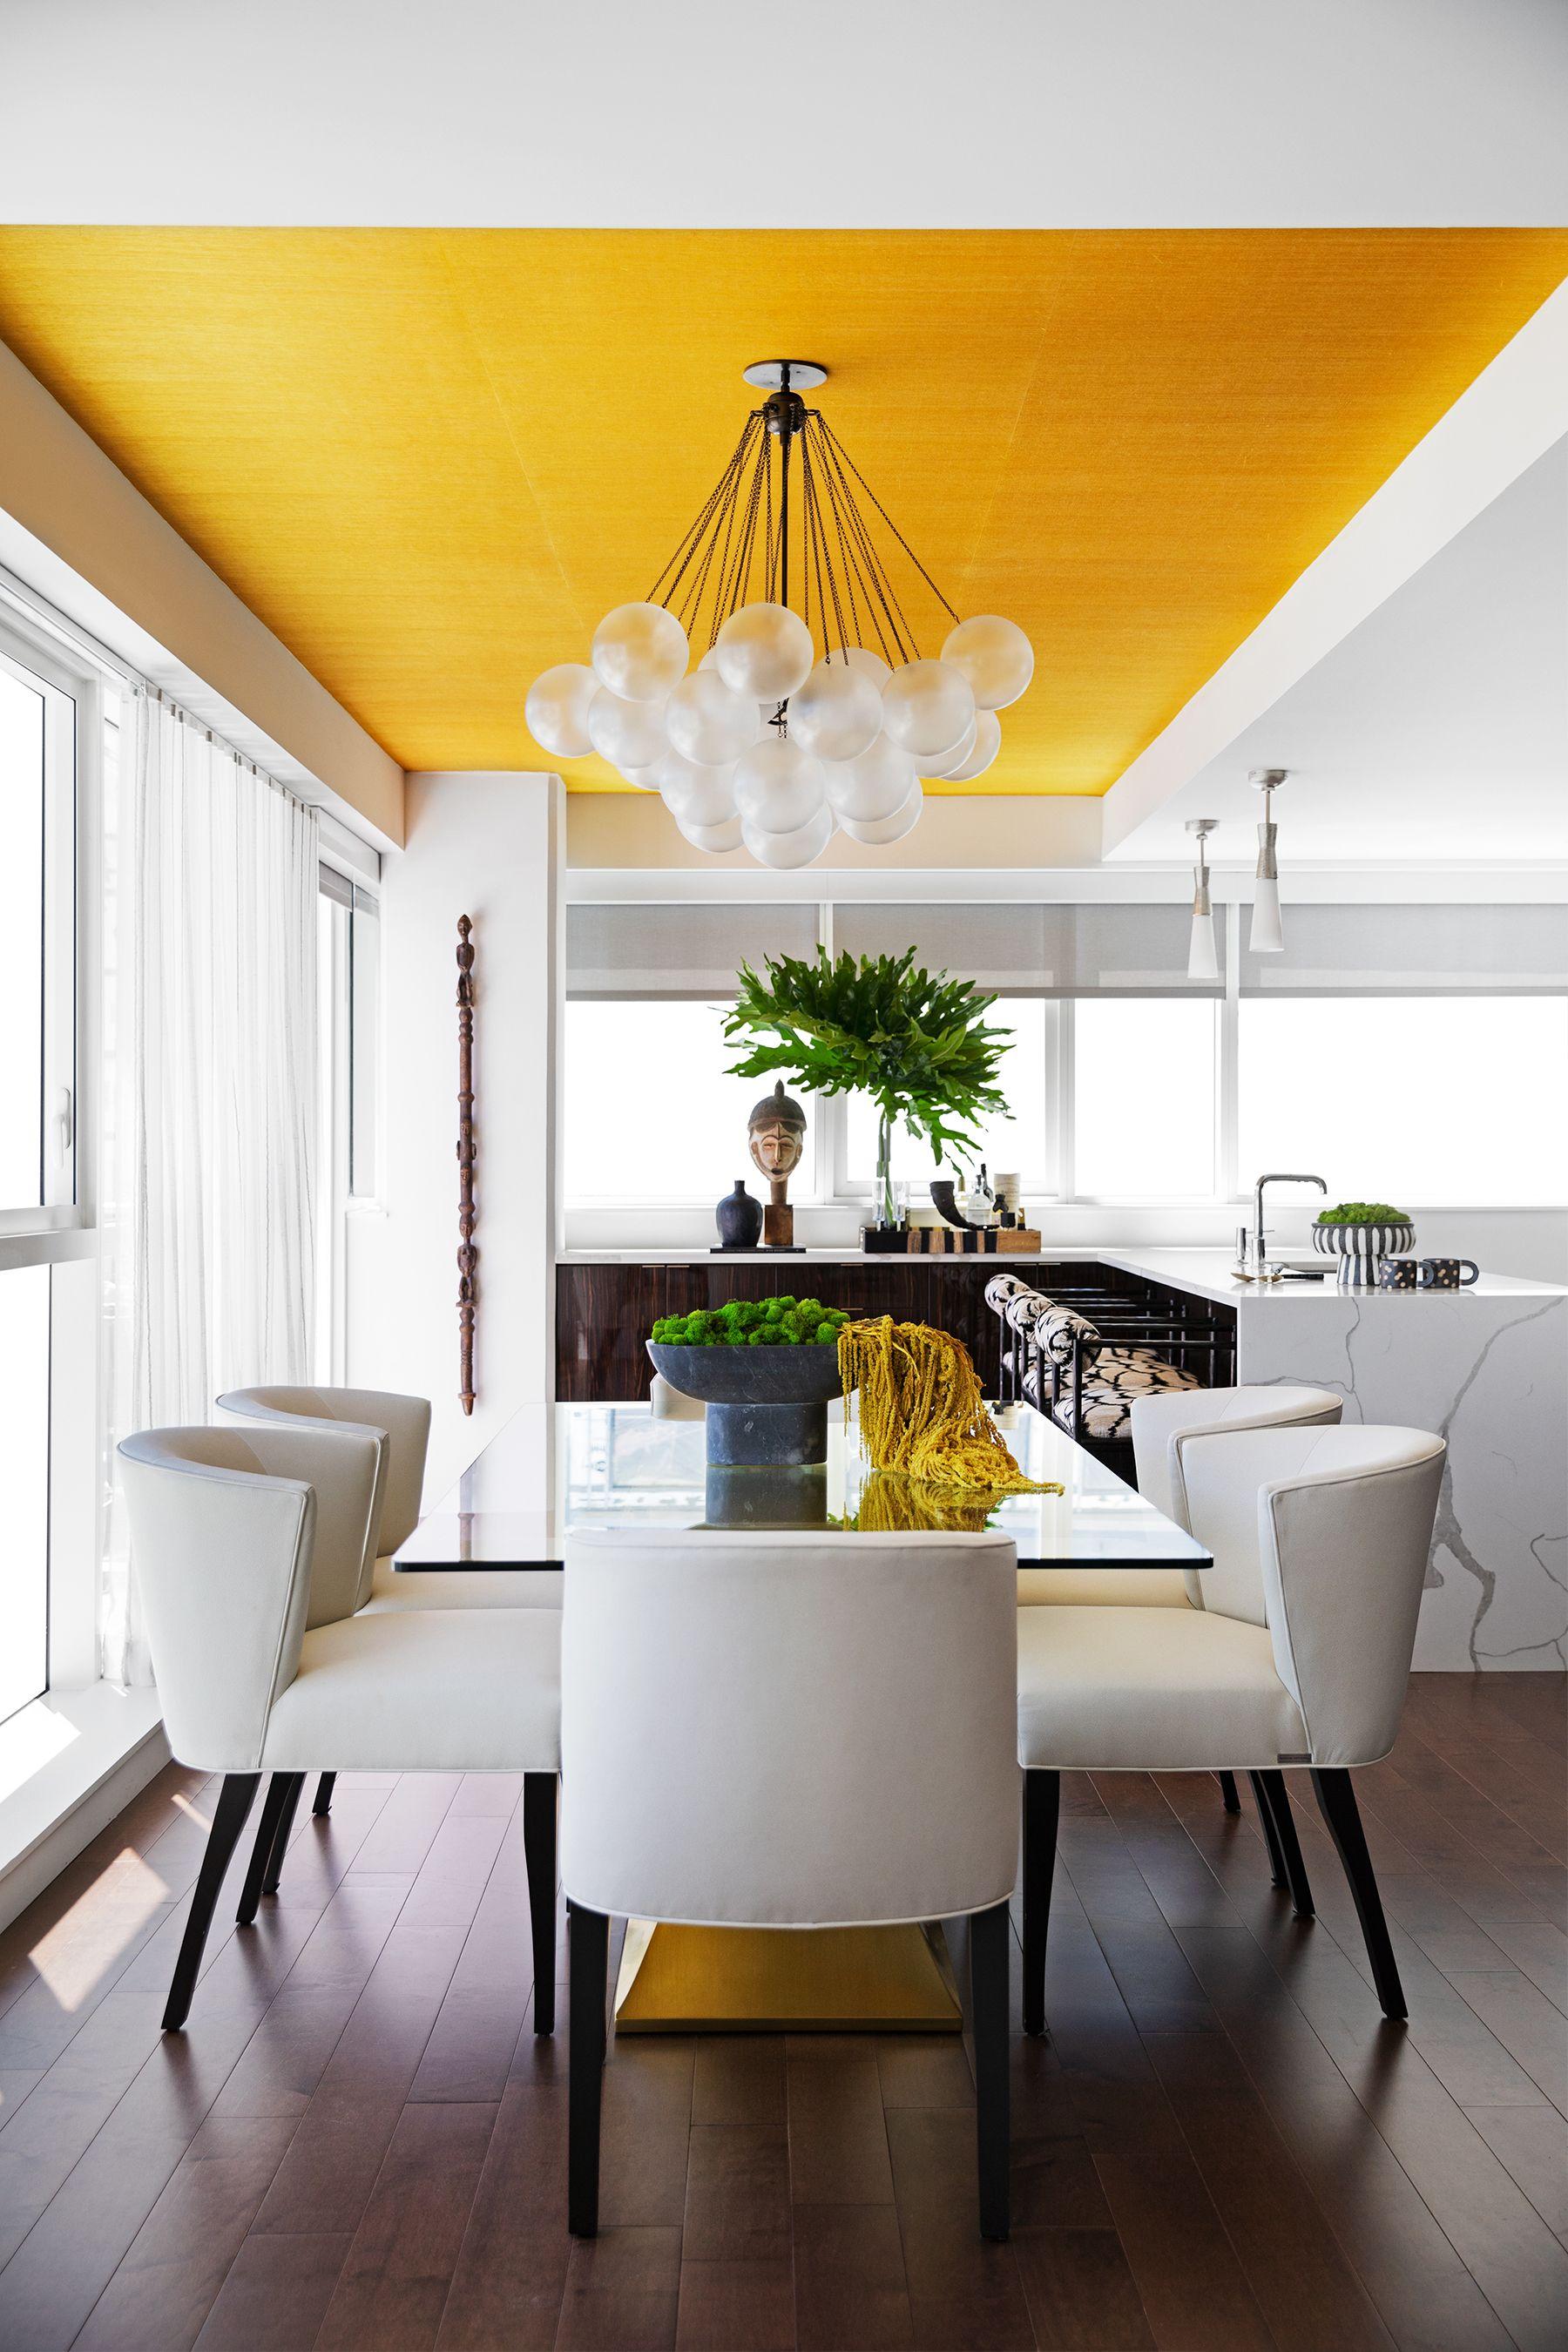 65 Best Dining Room Decorating Ideas, Modern Formal Dining Room Sets For 8